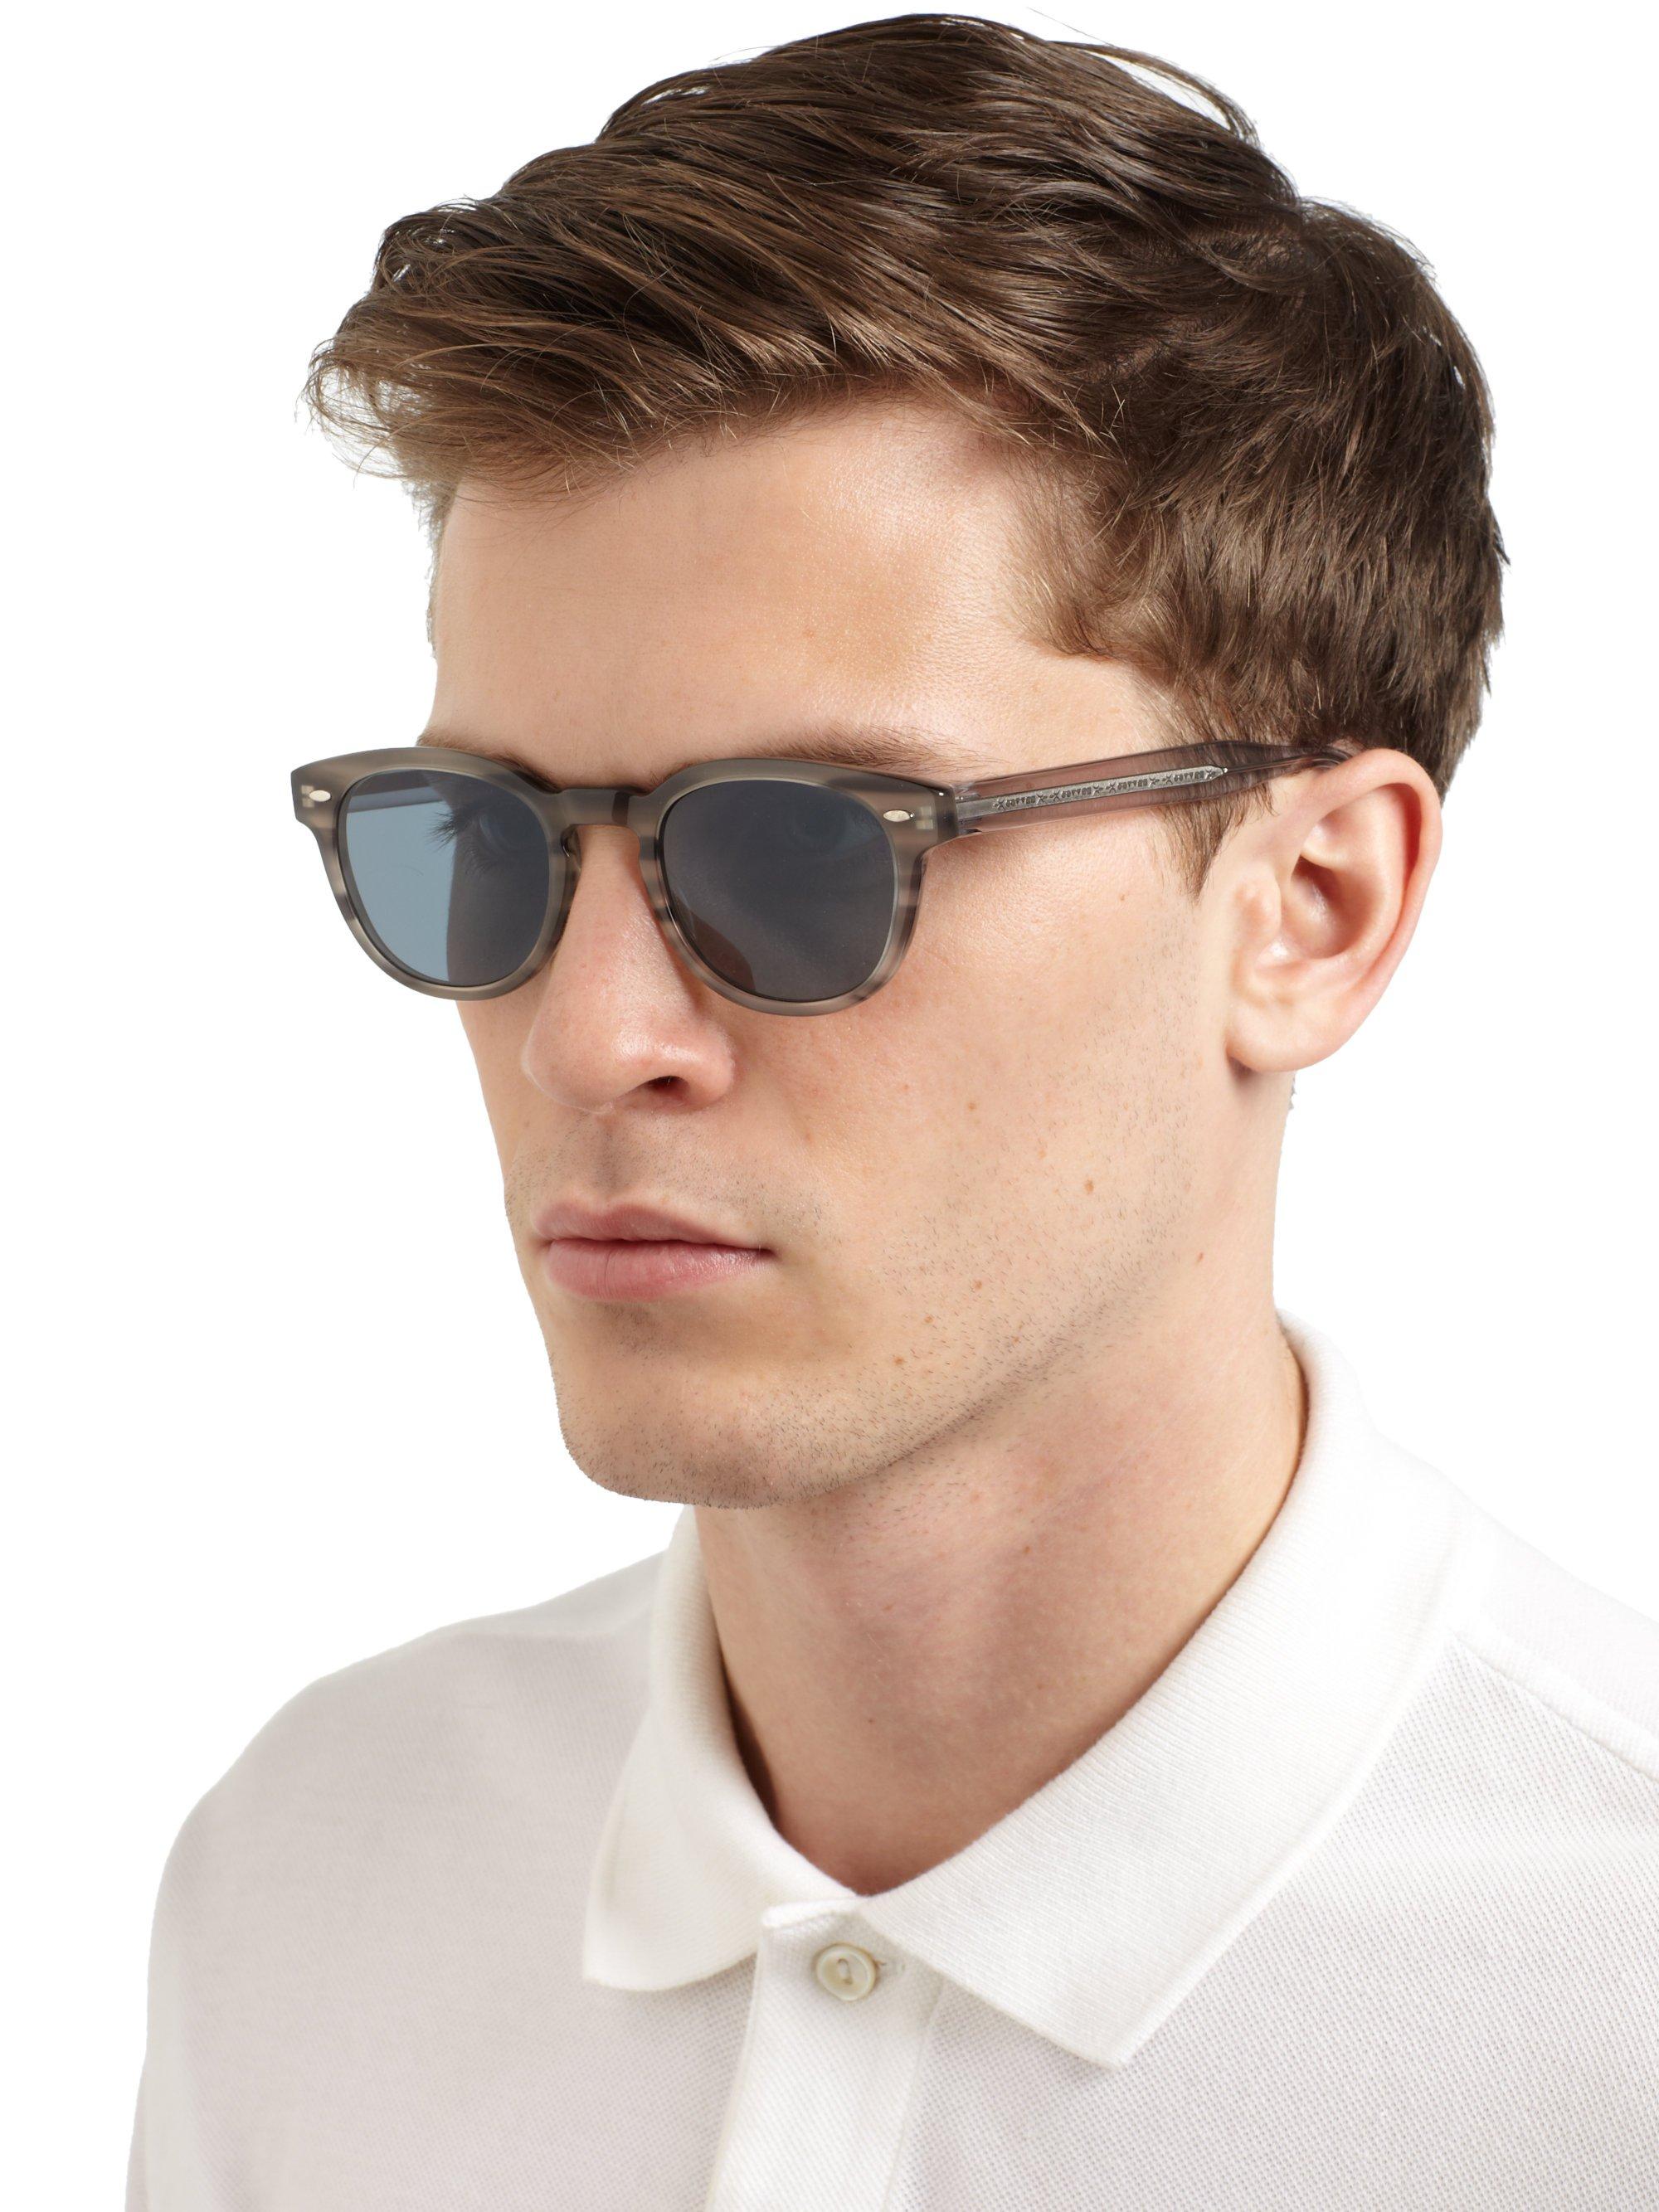 d6d0cbdac8d Oliver Peoples Sheldrake Sunglasses Online - Bitterroot Public Library